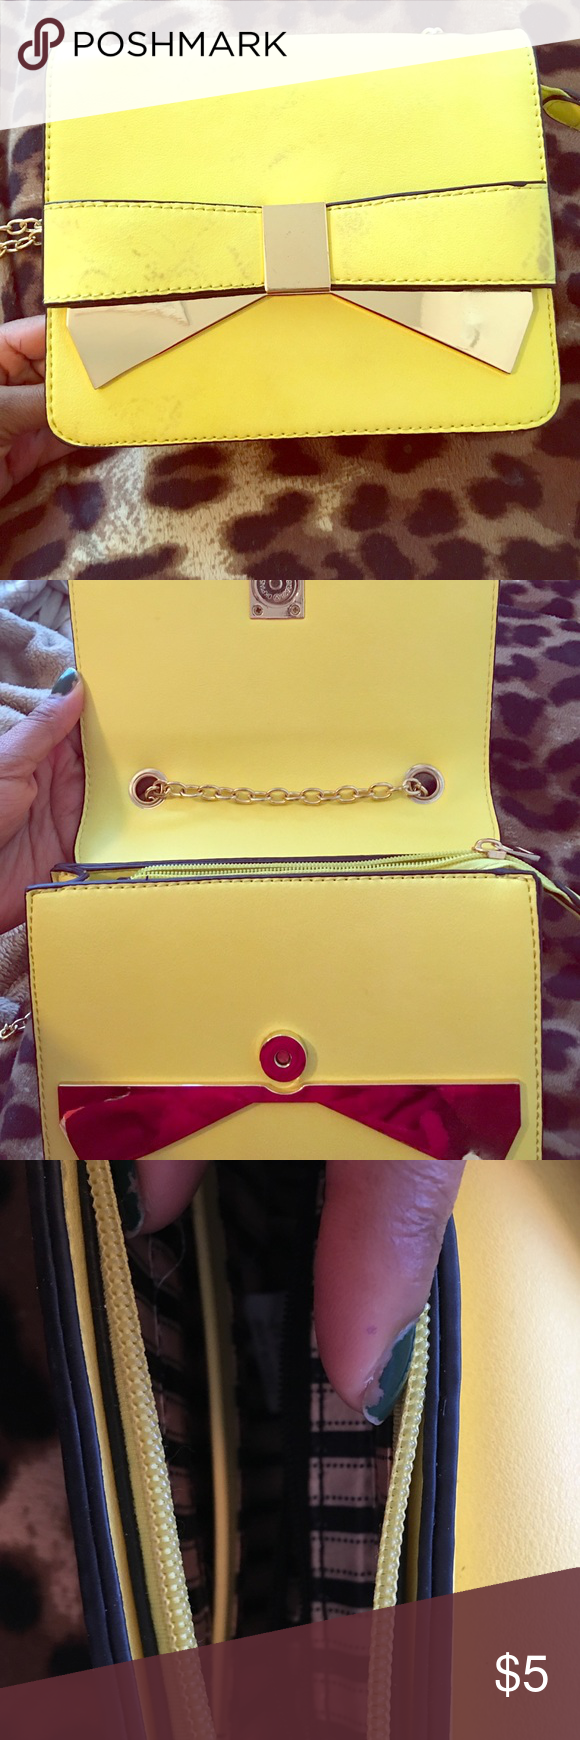 Bright yellow purse Bright lemon yellow purse with gold